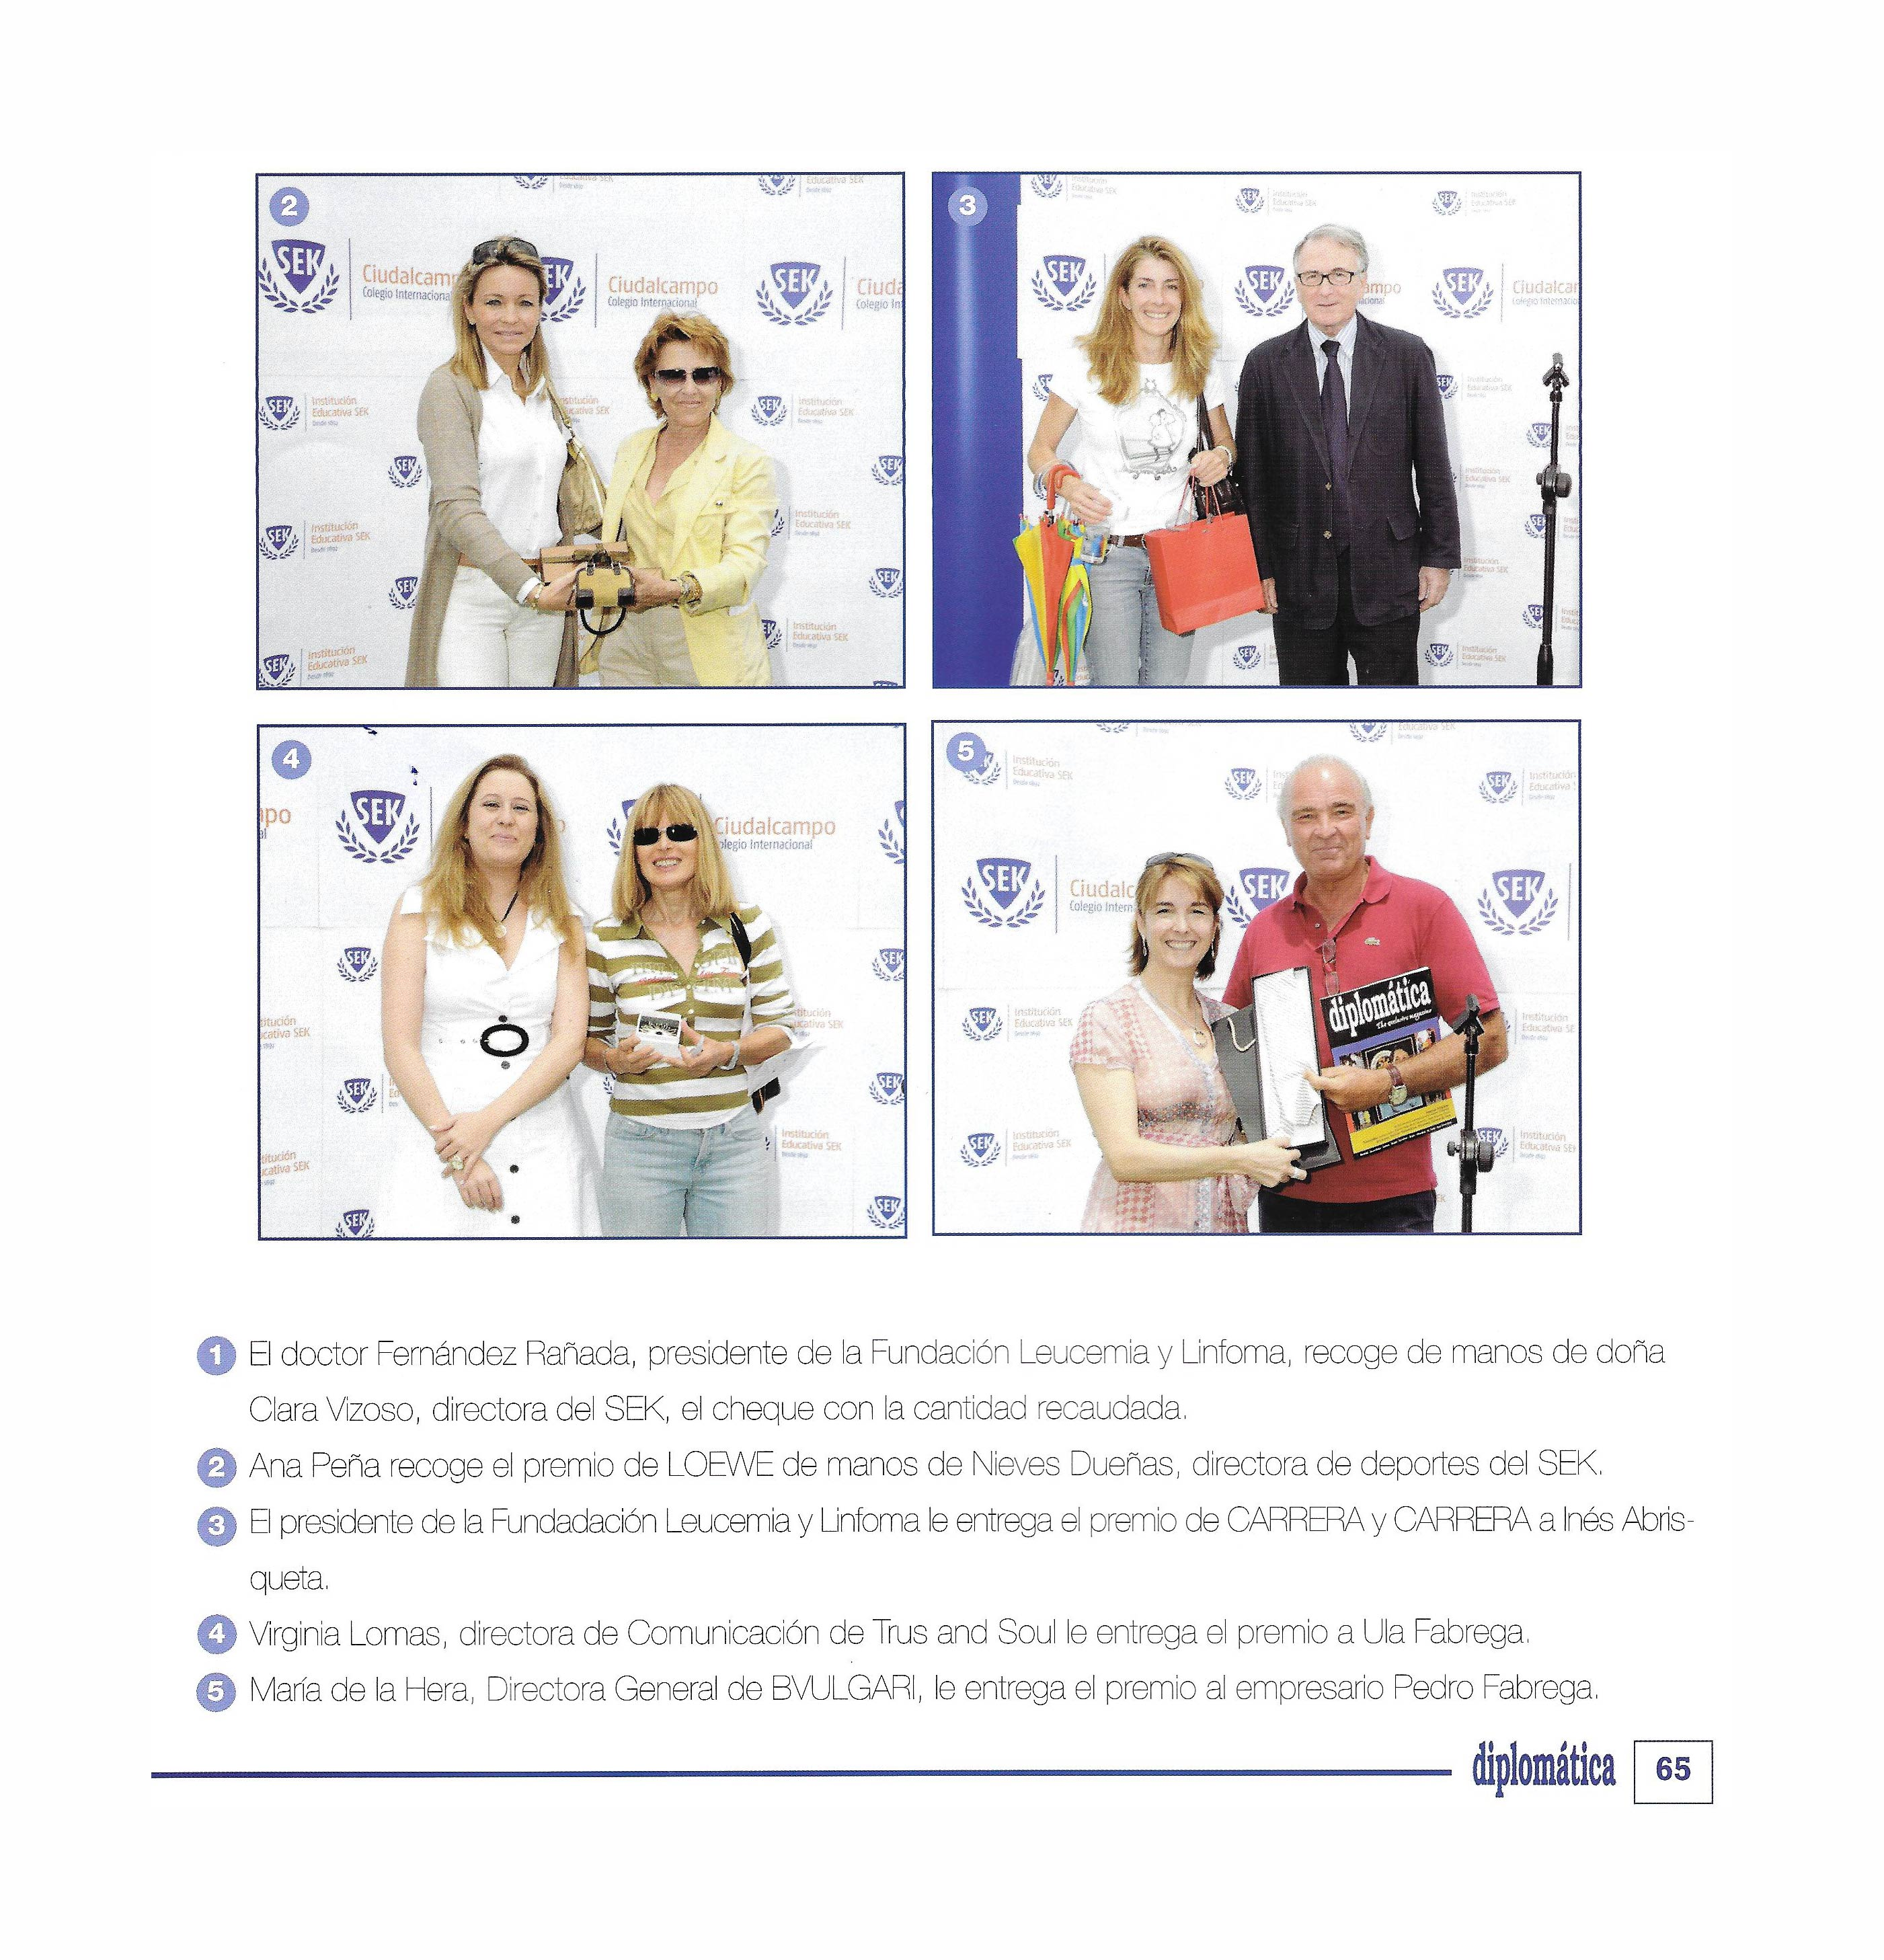 Ana Peña recoge el premio LOEWE